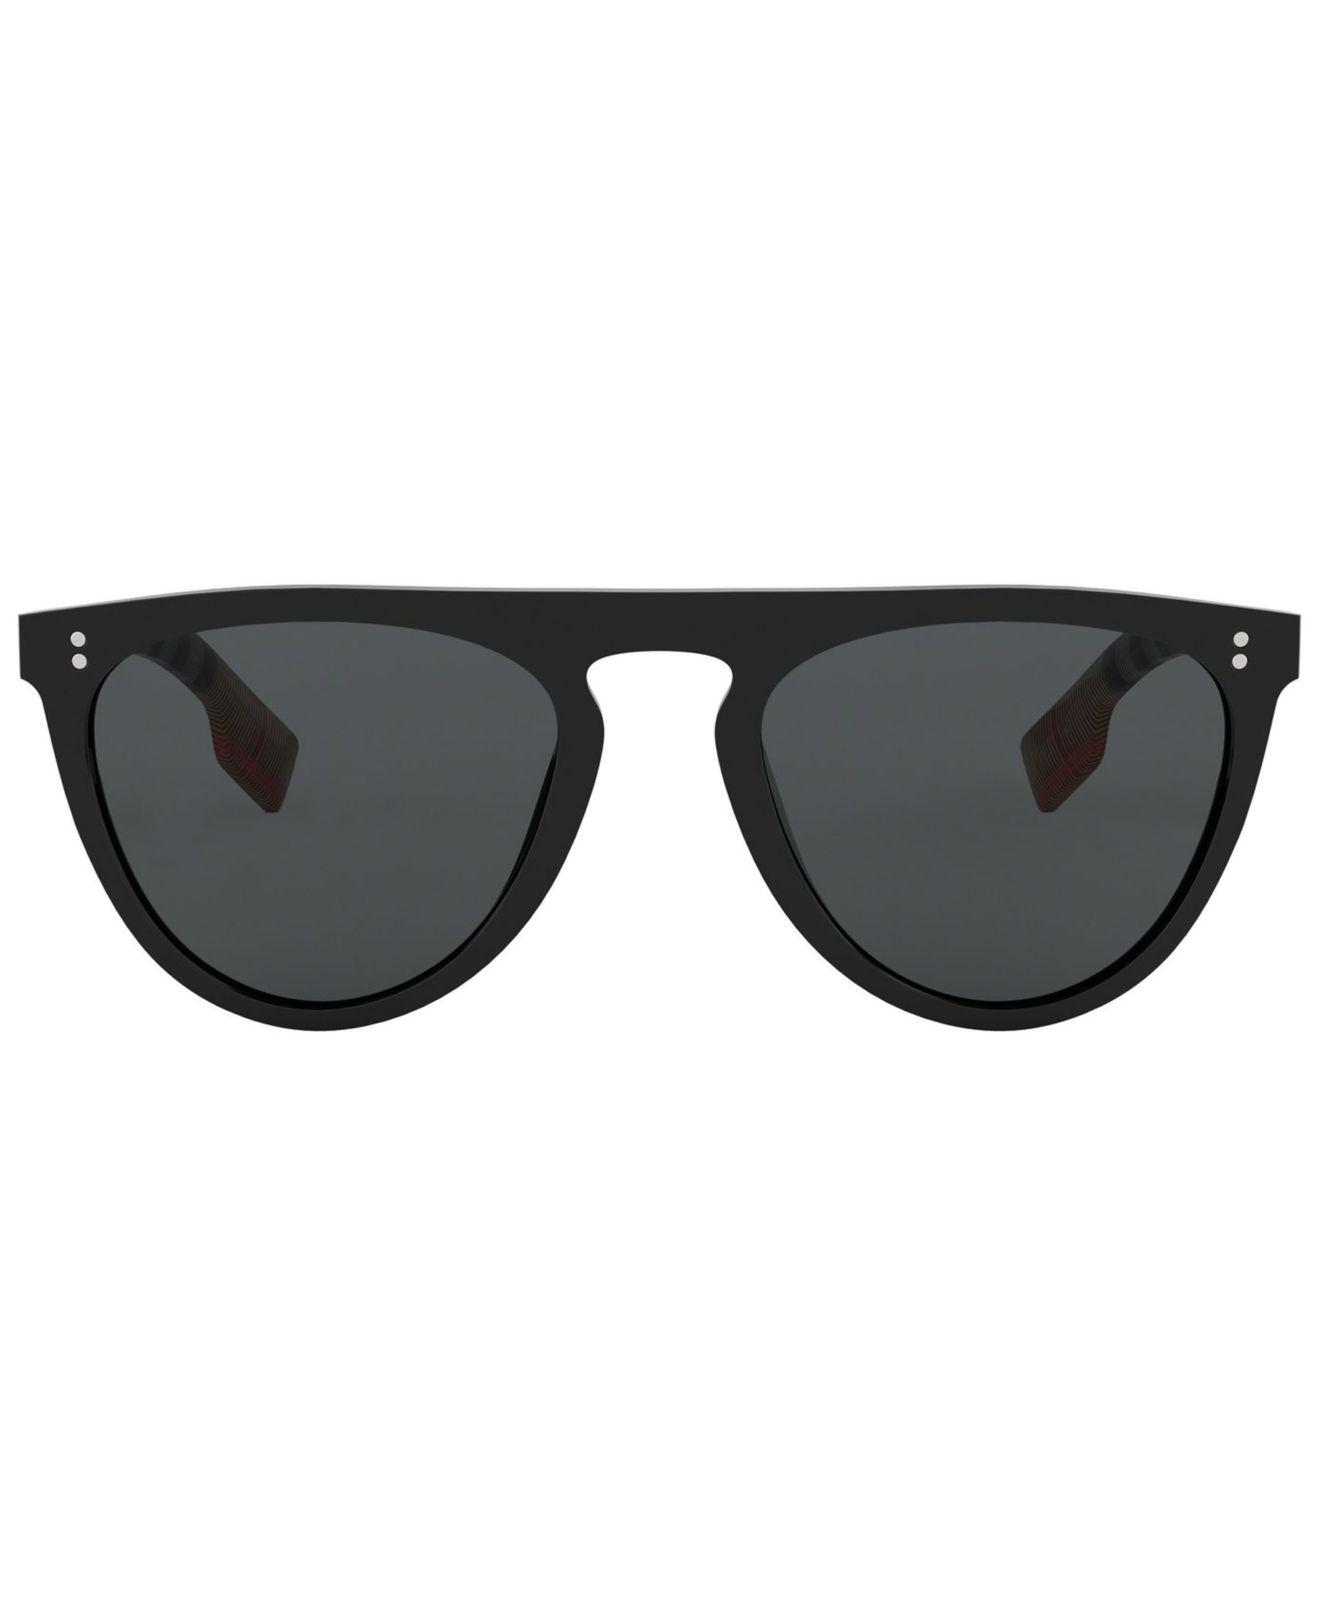 33daffbe425 Lyst - Burberry Be4281 in Black for Men